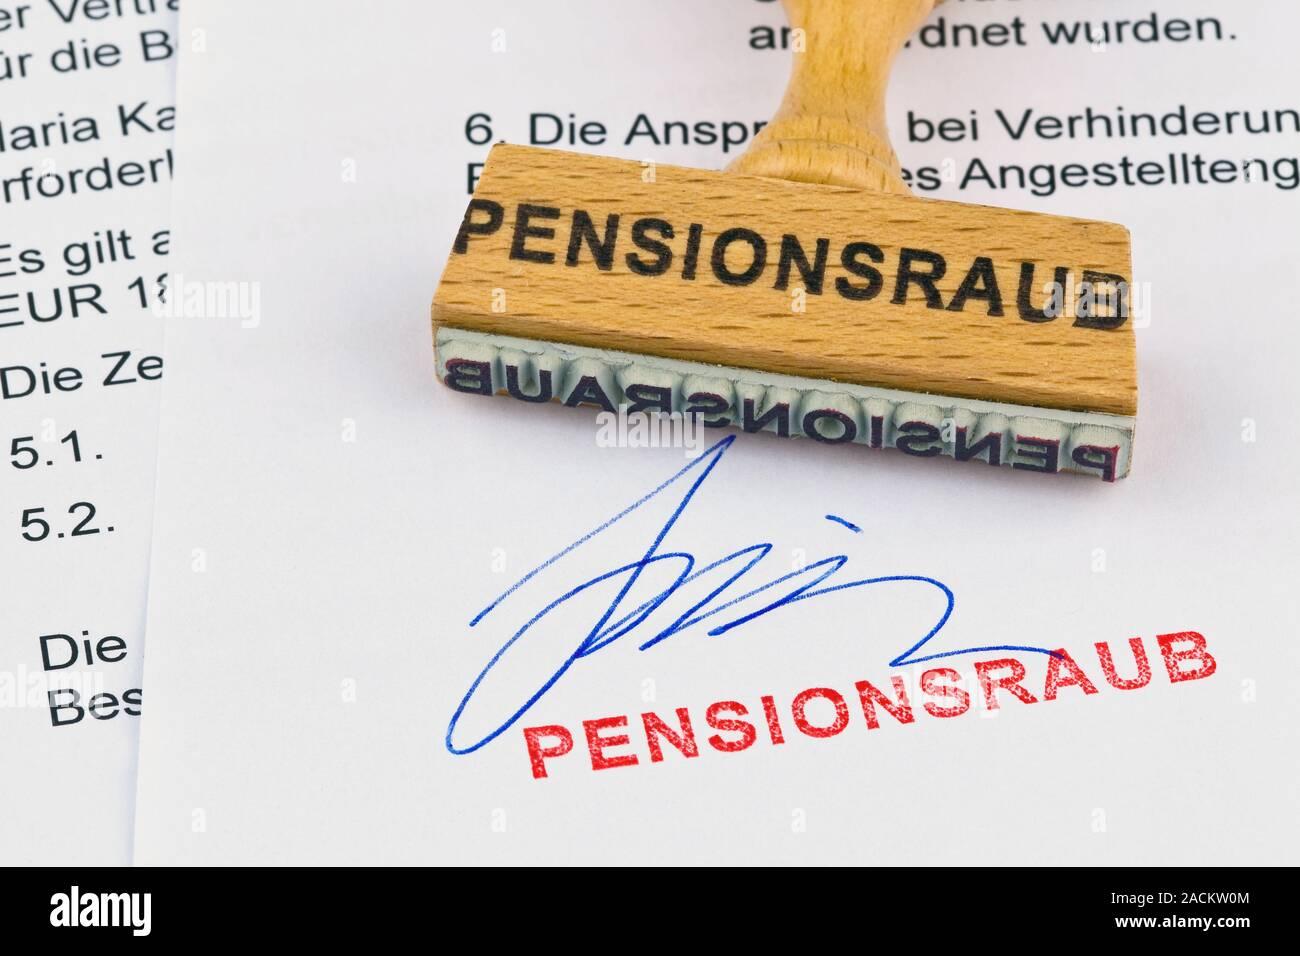 Wood stamp on document: Pensionsraub Stock Photo